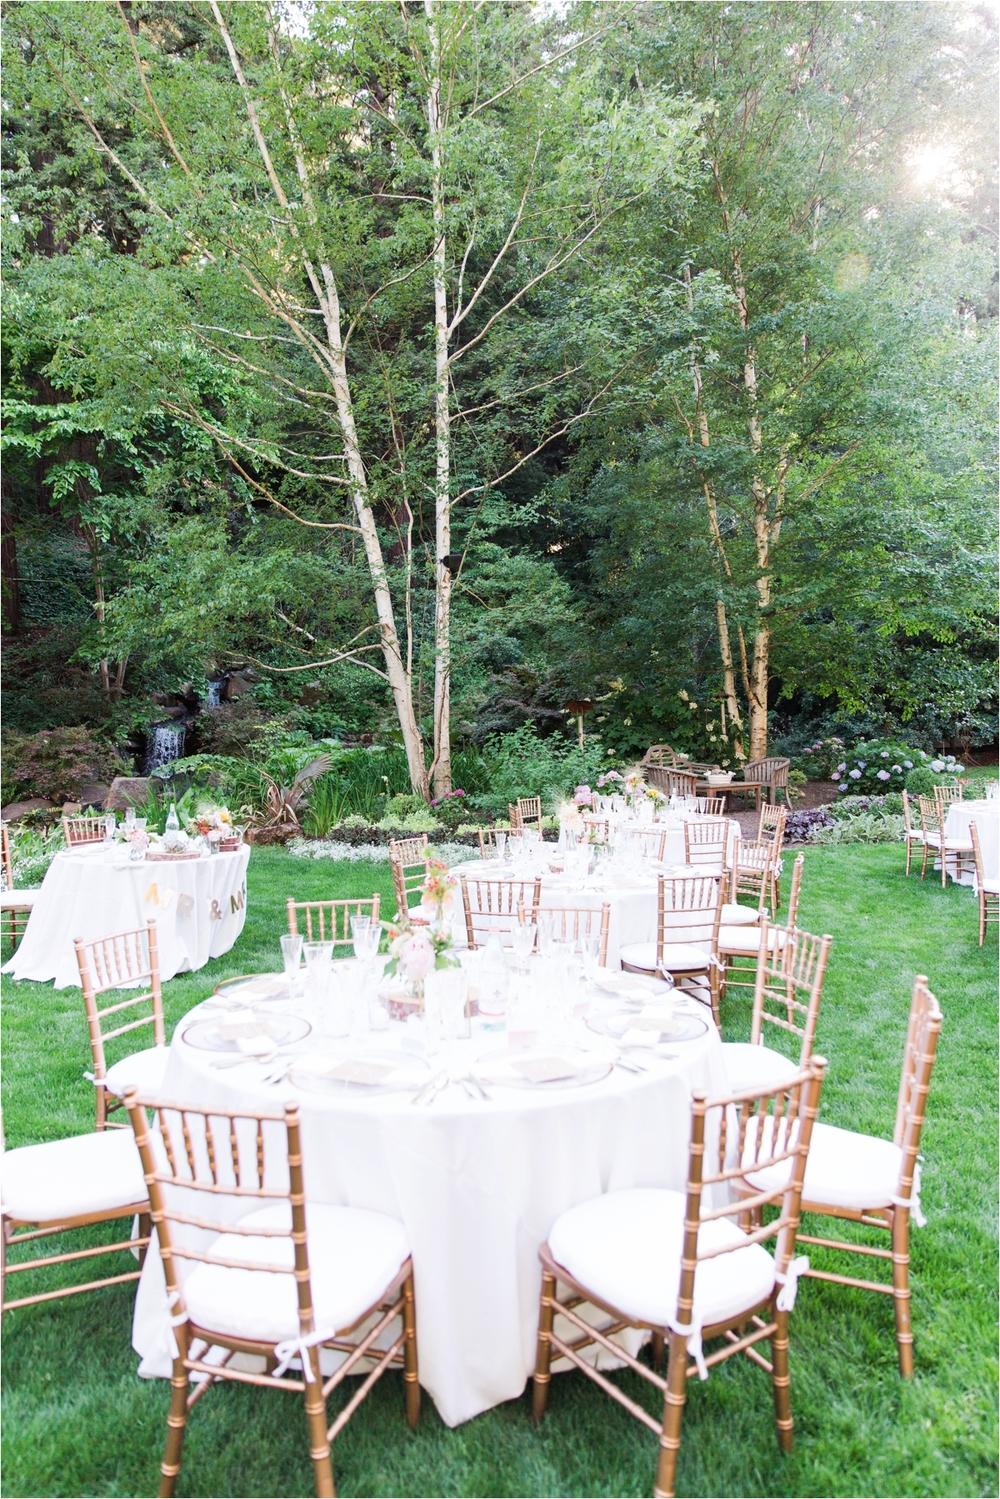 Nestldown wedding Photos by Briana Calderon Photography_0147.jpg